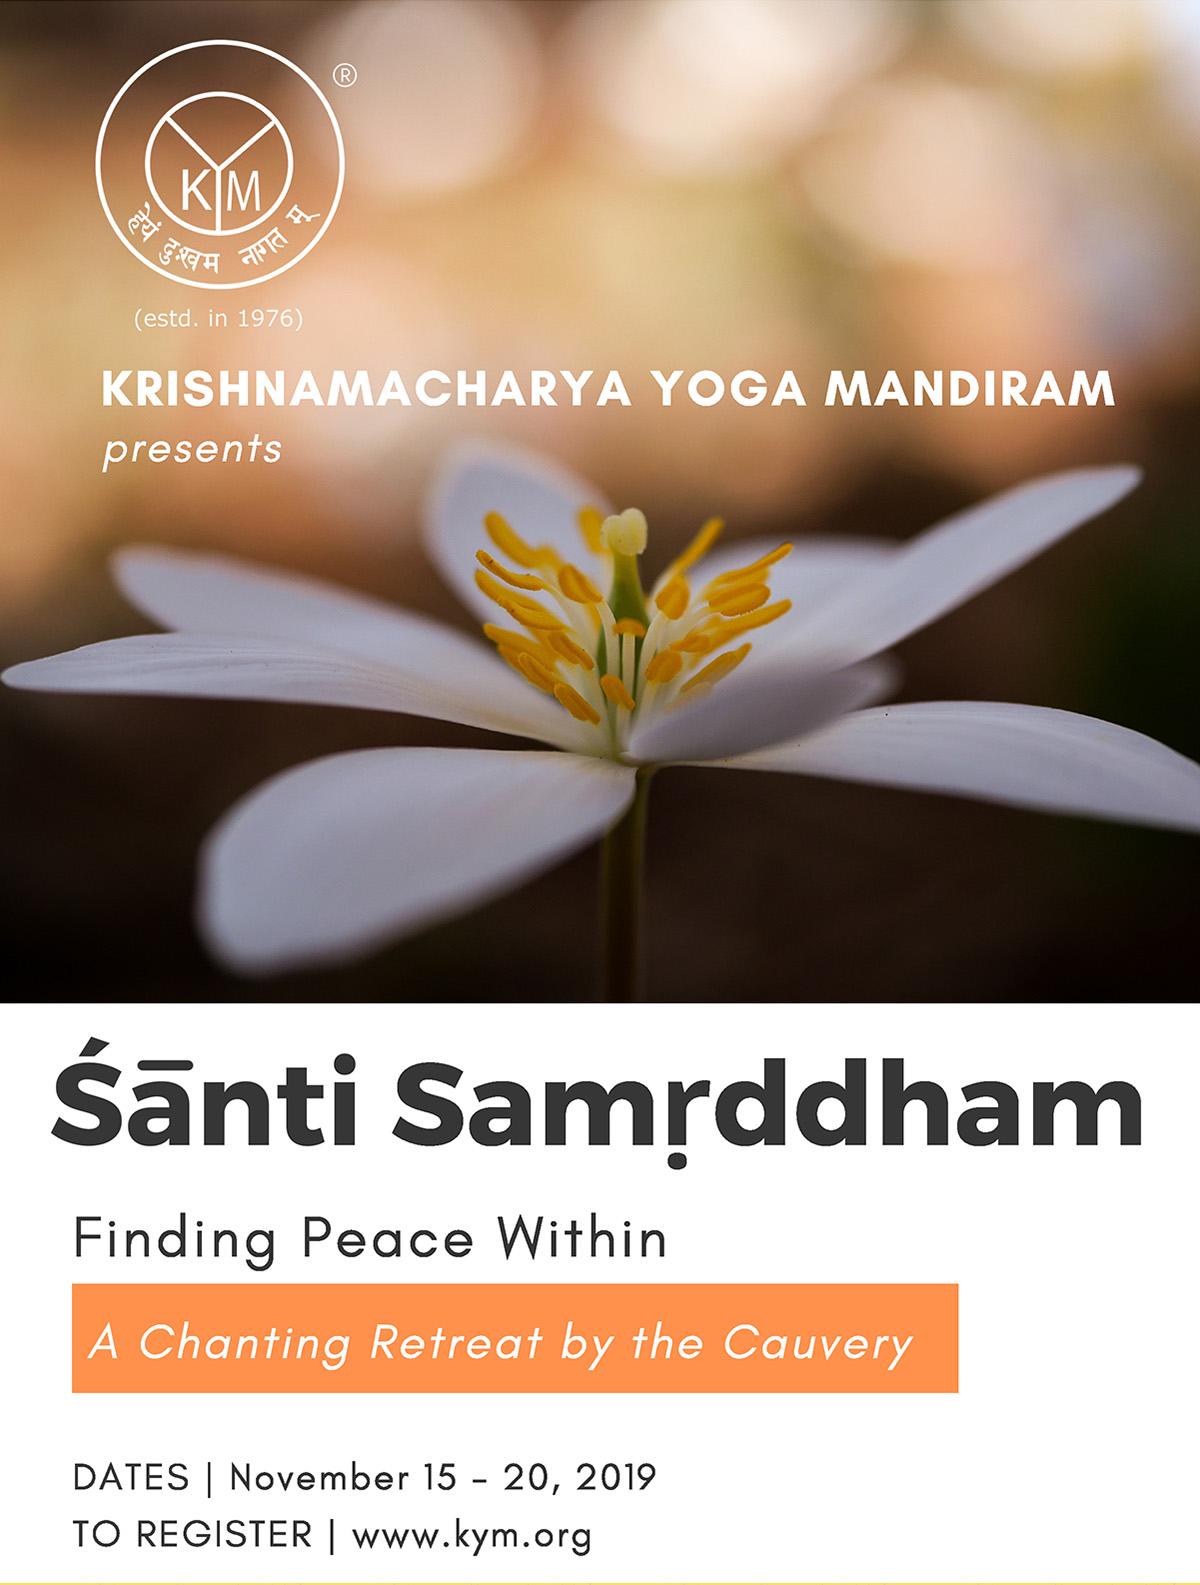 Śānti Samṛddham | Peace In Plenty